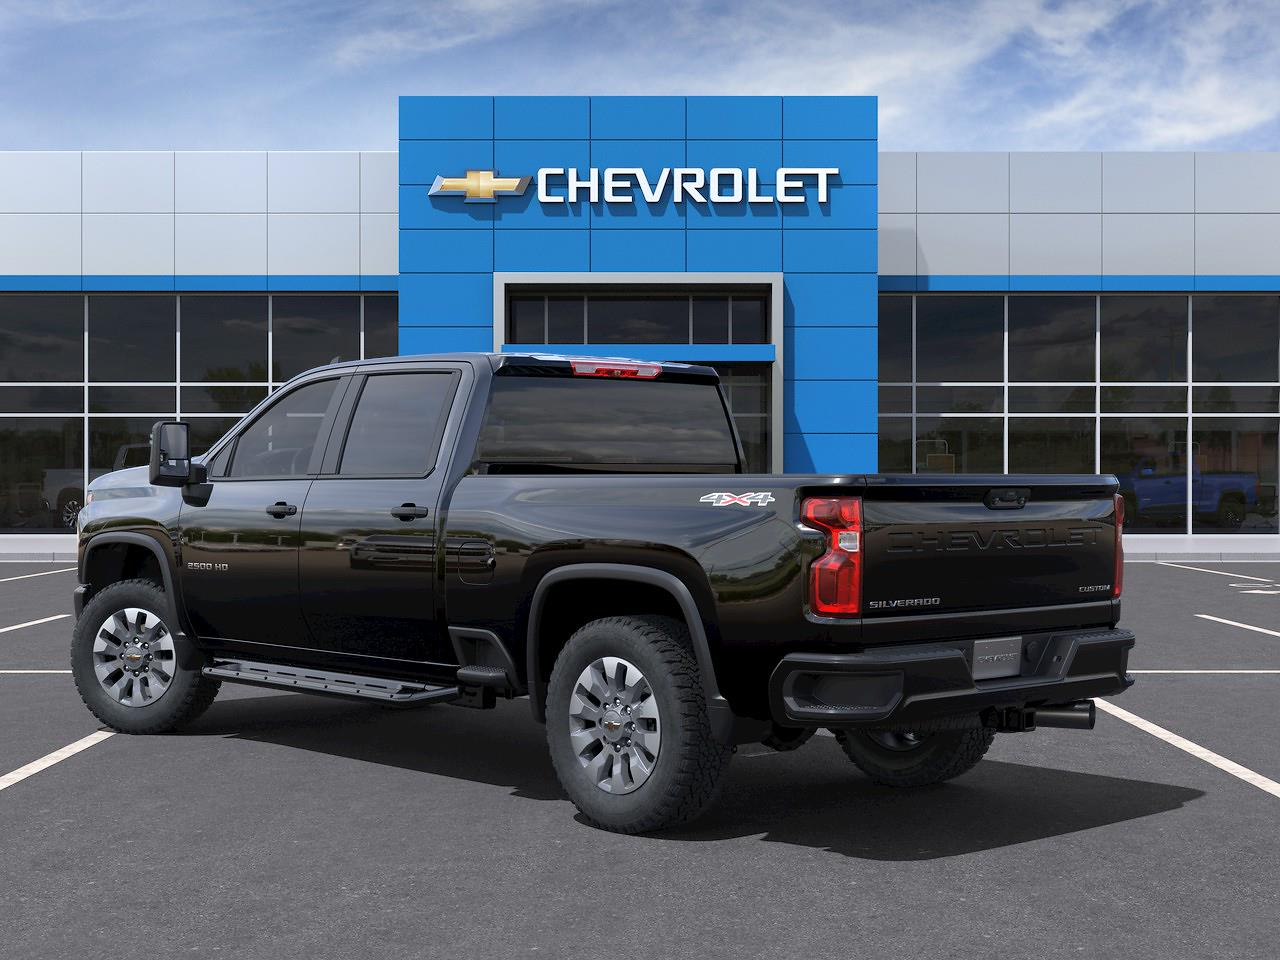 2021 Chevrolet Silverado 2500 Crew Cab 4x4, Pickup #Q210448 - photo 4